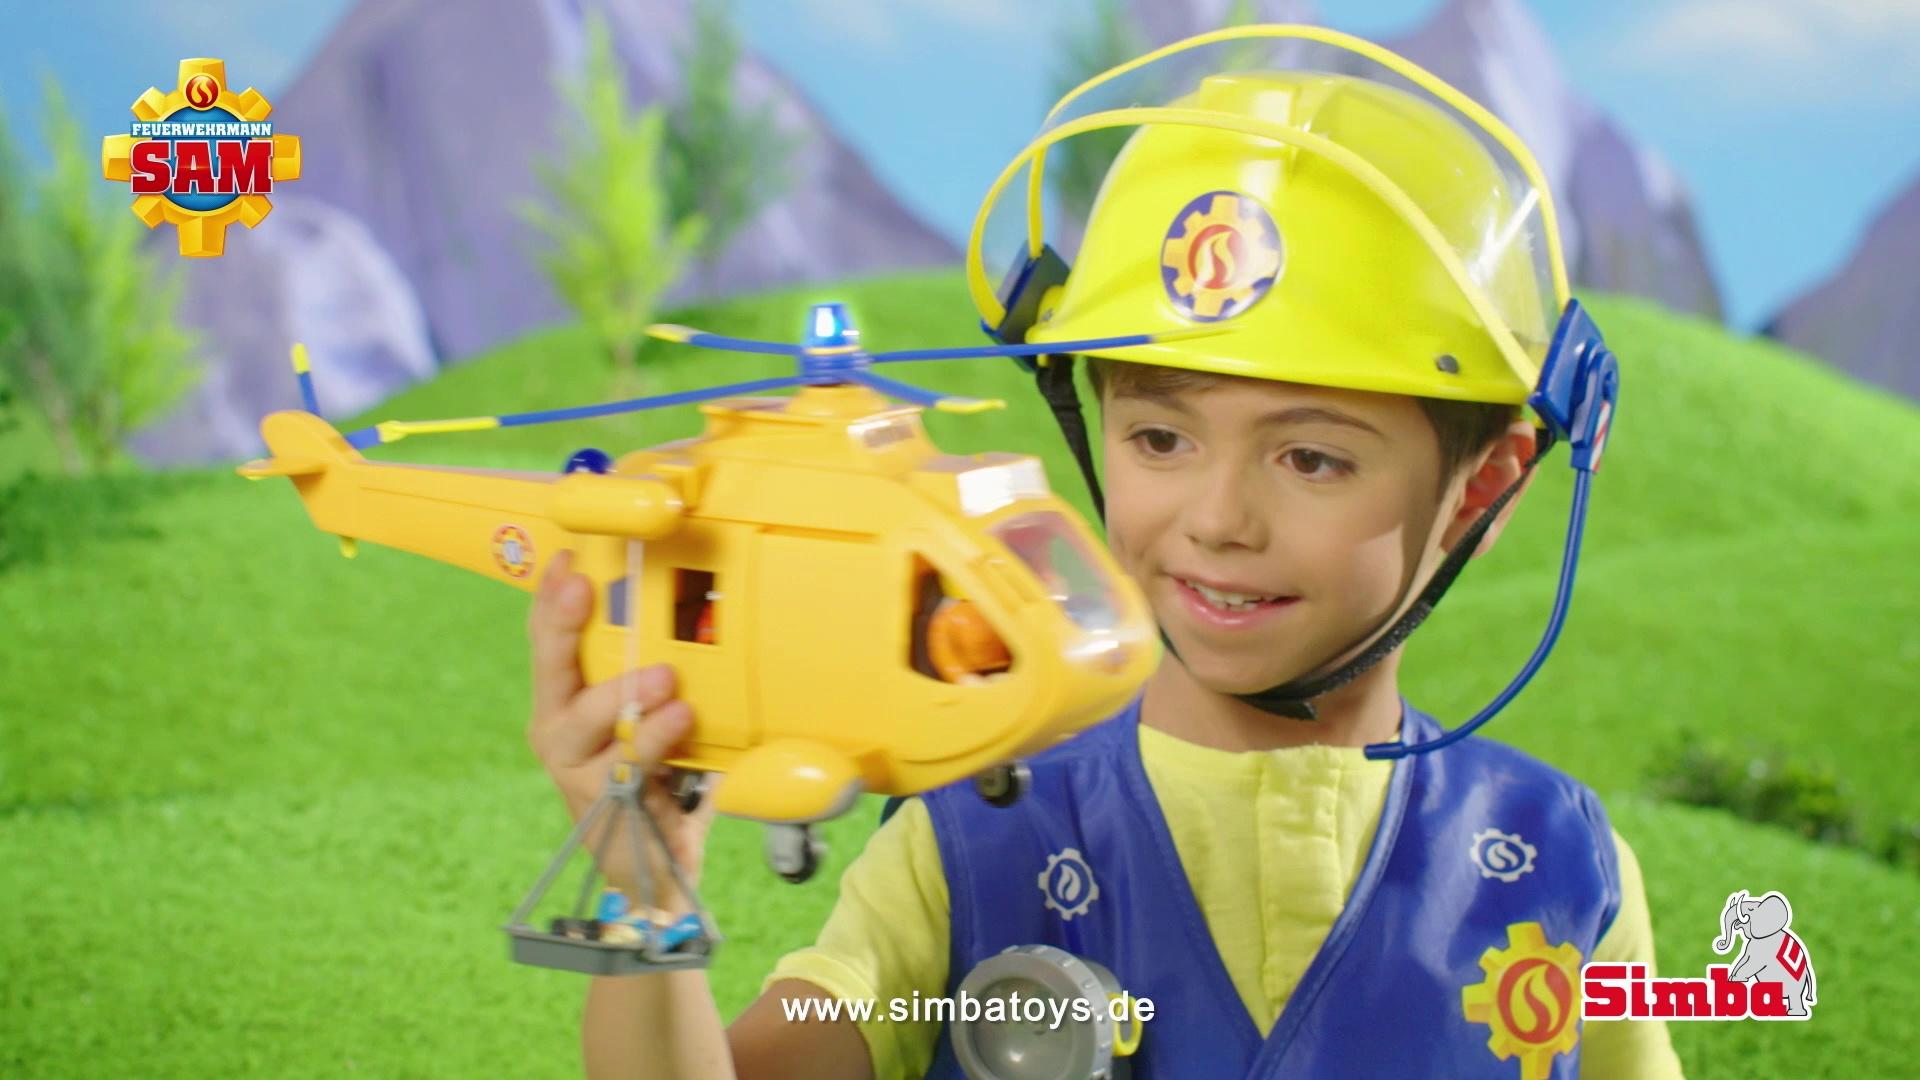 feuerwehrmann sam hubschrauber wallaby ii  simba toys